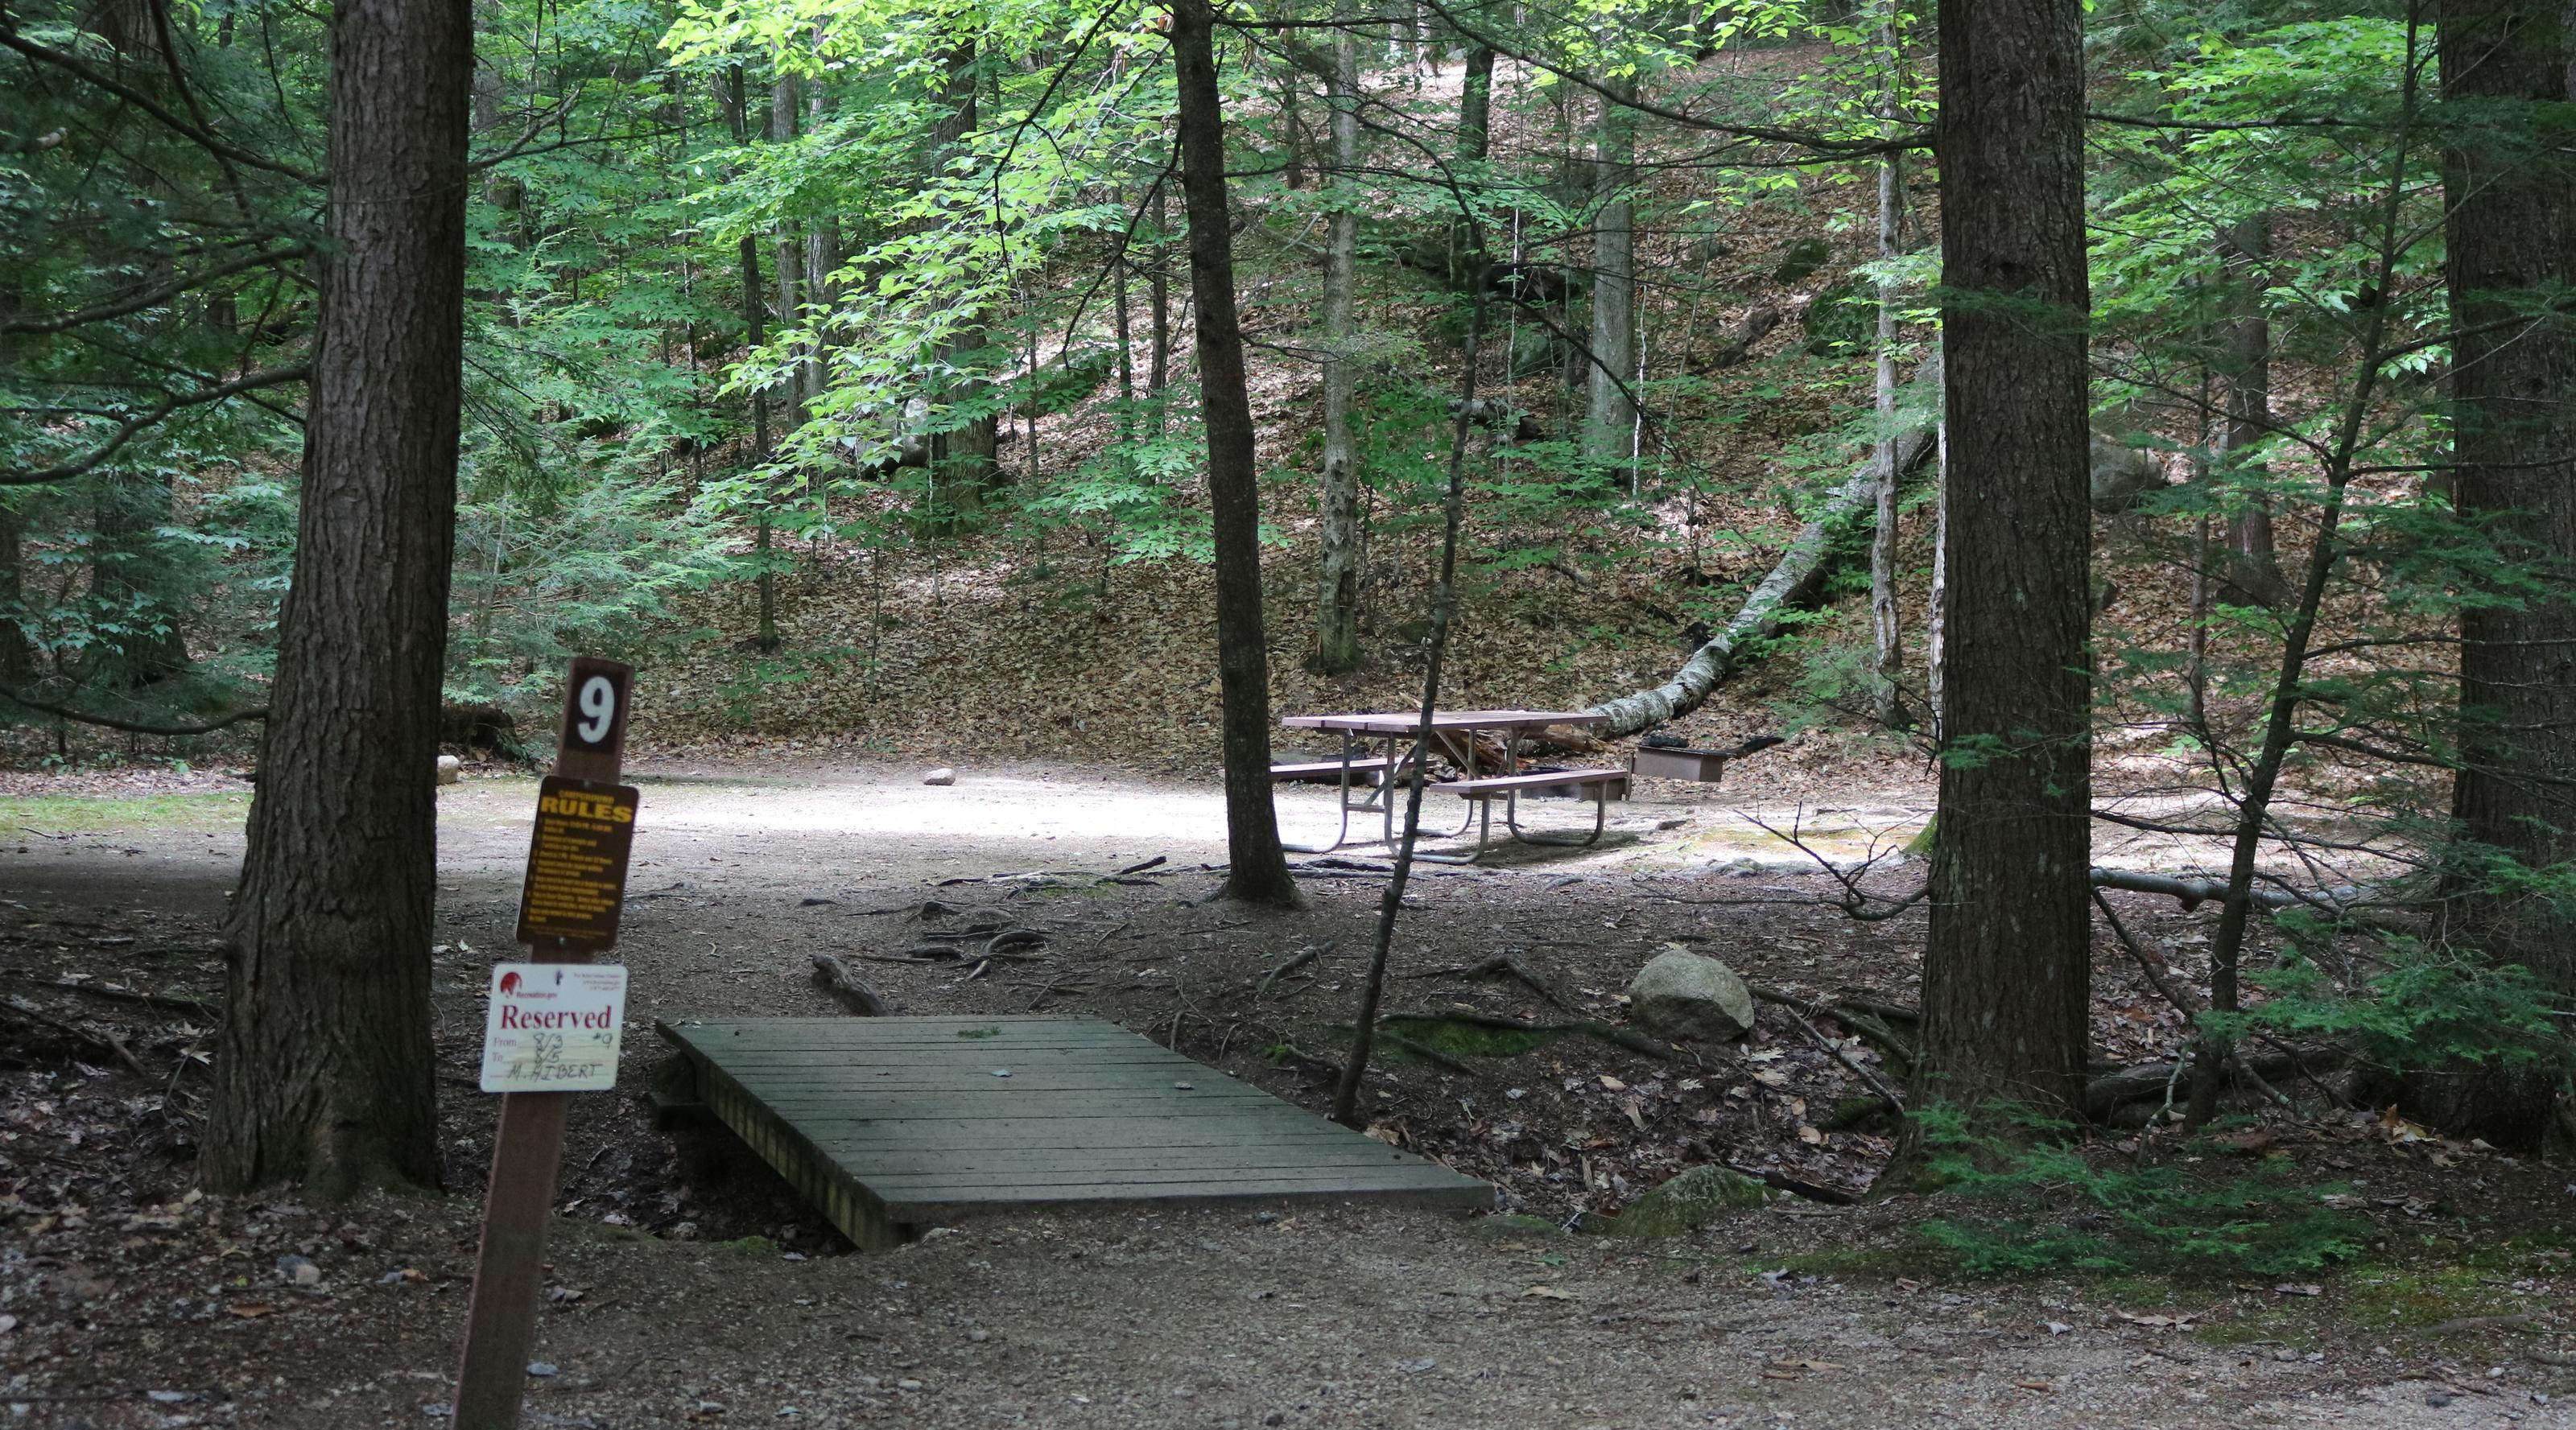 White Ledge CampsiteSite 9 at White Ledge Campground